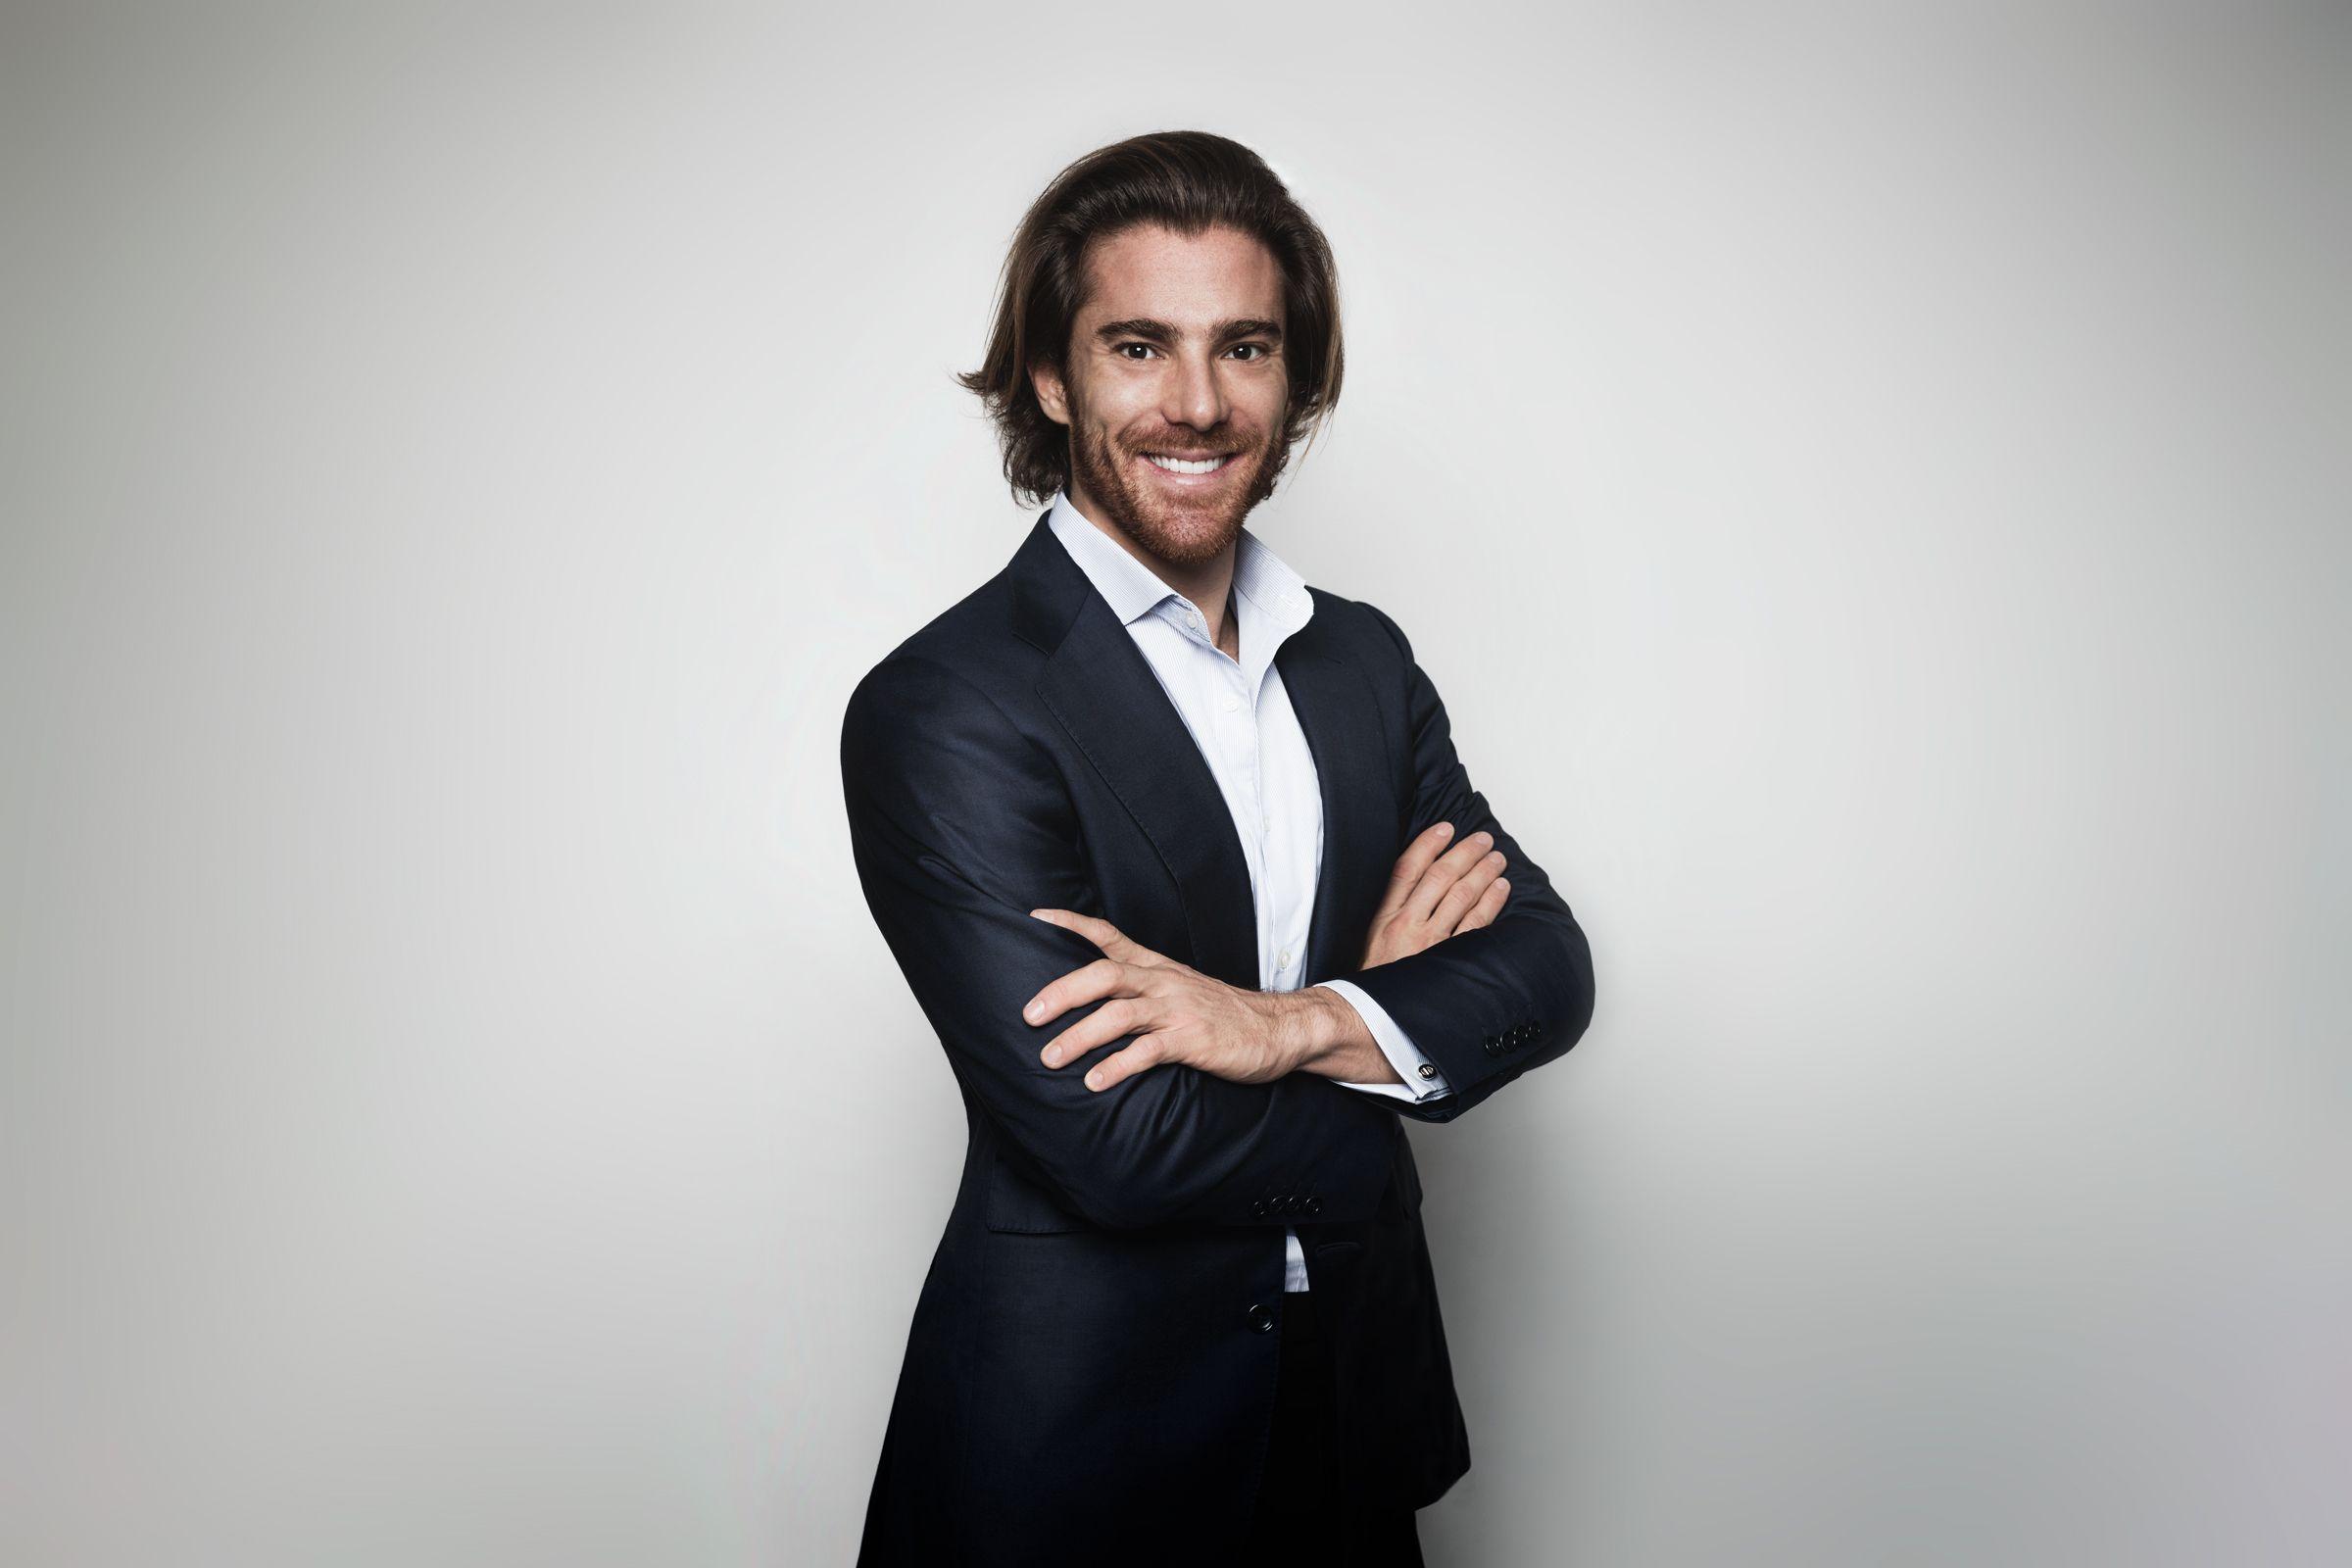 Foto de Dimas de Andrés Puyol, CEO de Medcap Real Estate